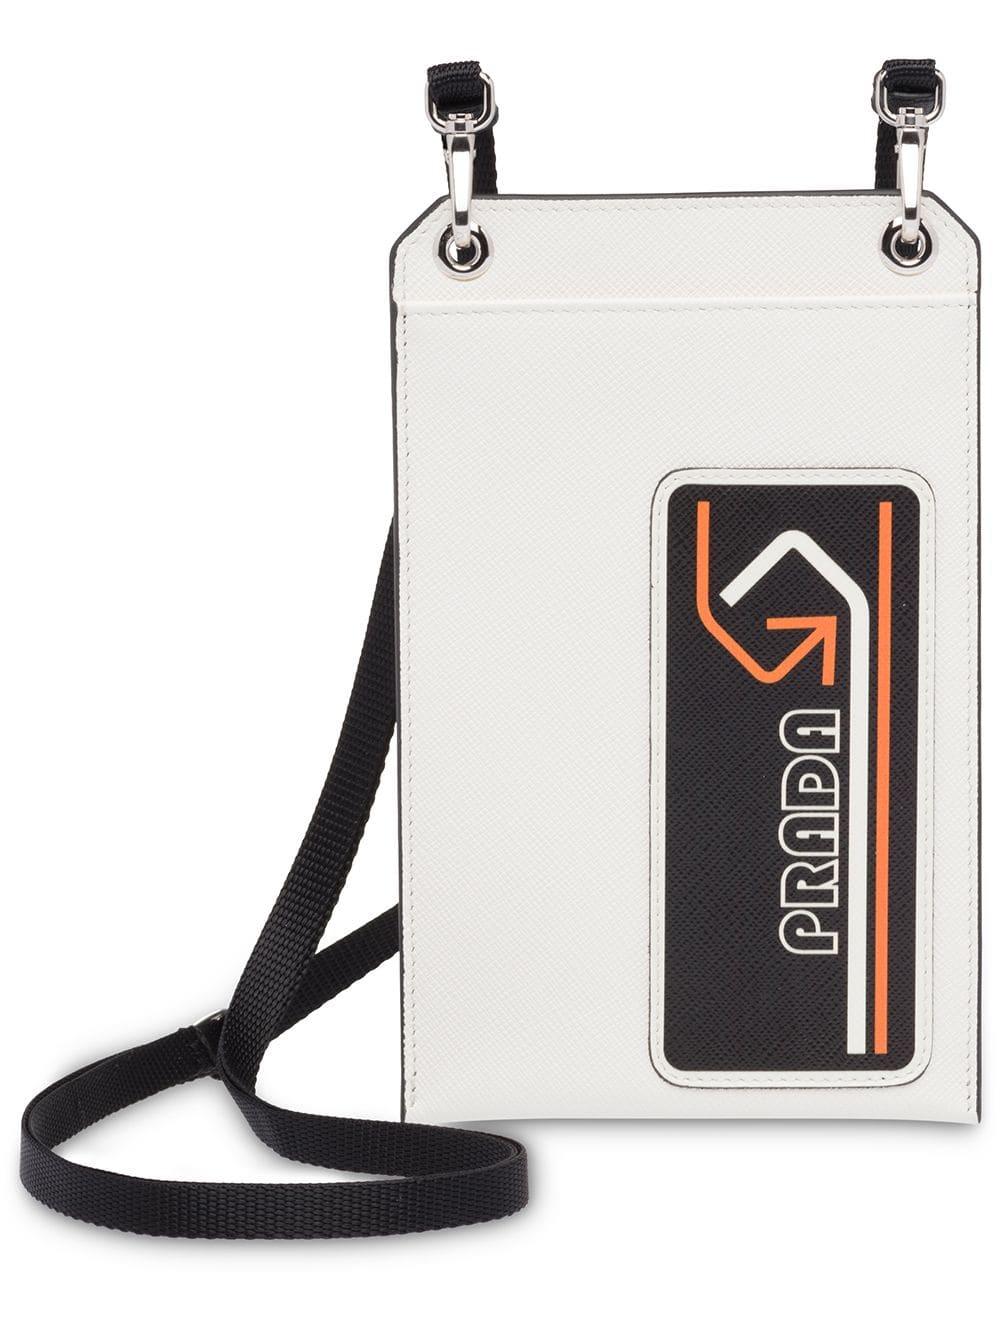 3b69516447 Prada saffiano badge holder - White   Products in 2019   Prada ...